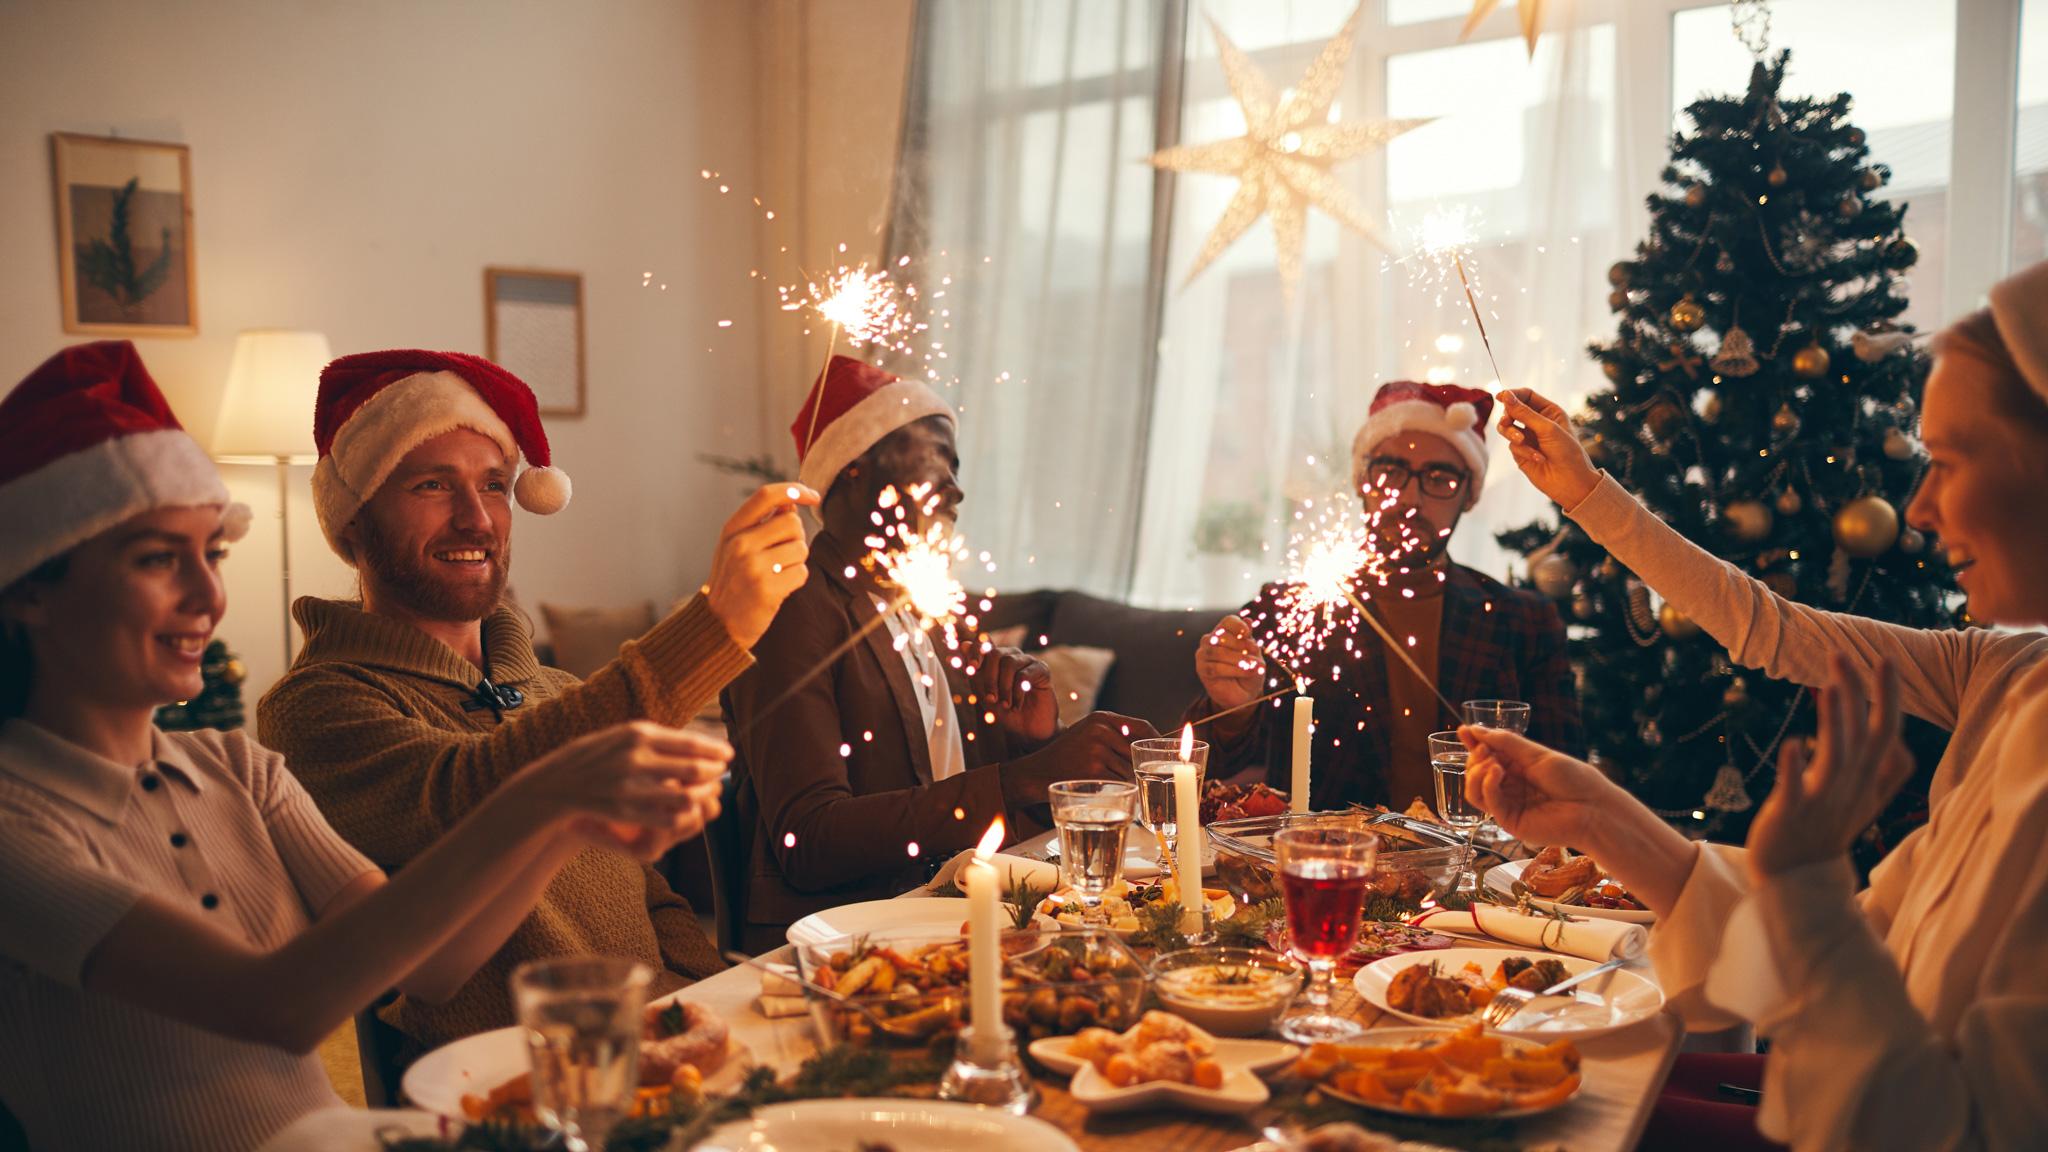 Multi-ethnic group of people raising glasses while enjoying Christmas dinner at home